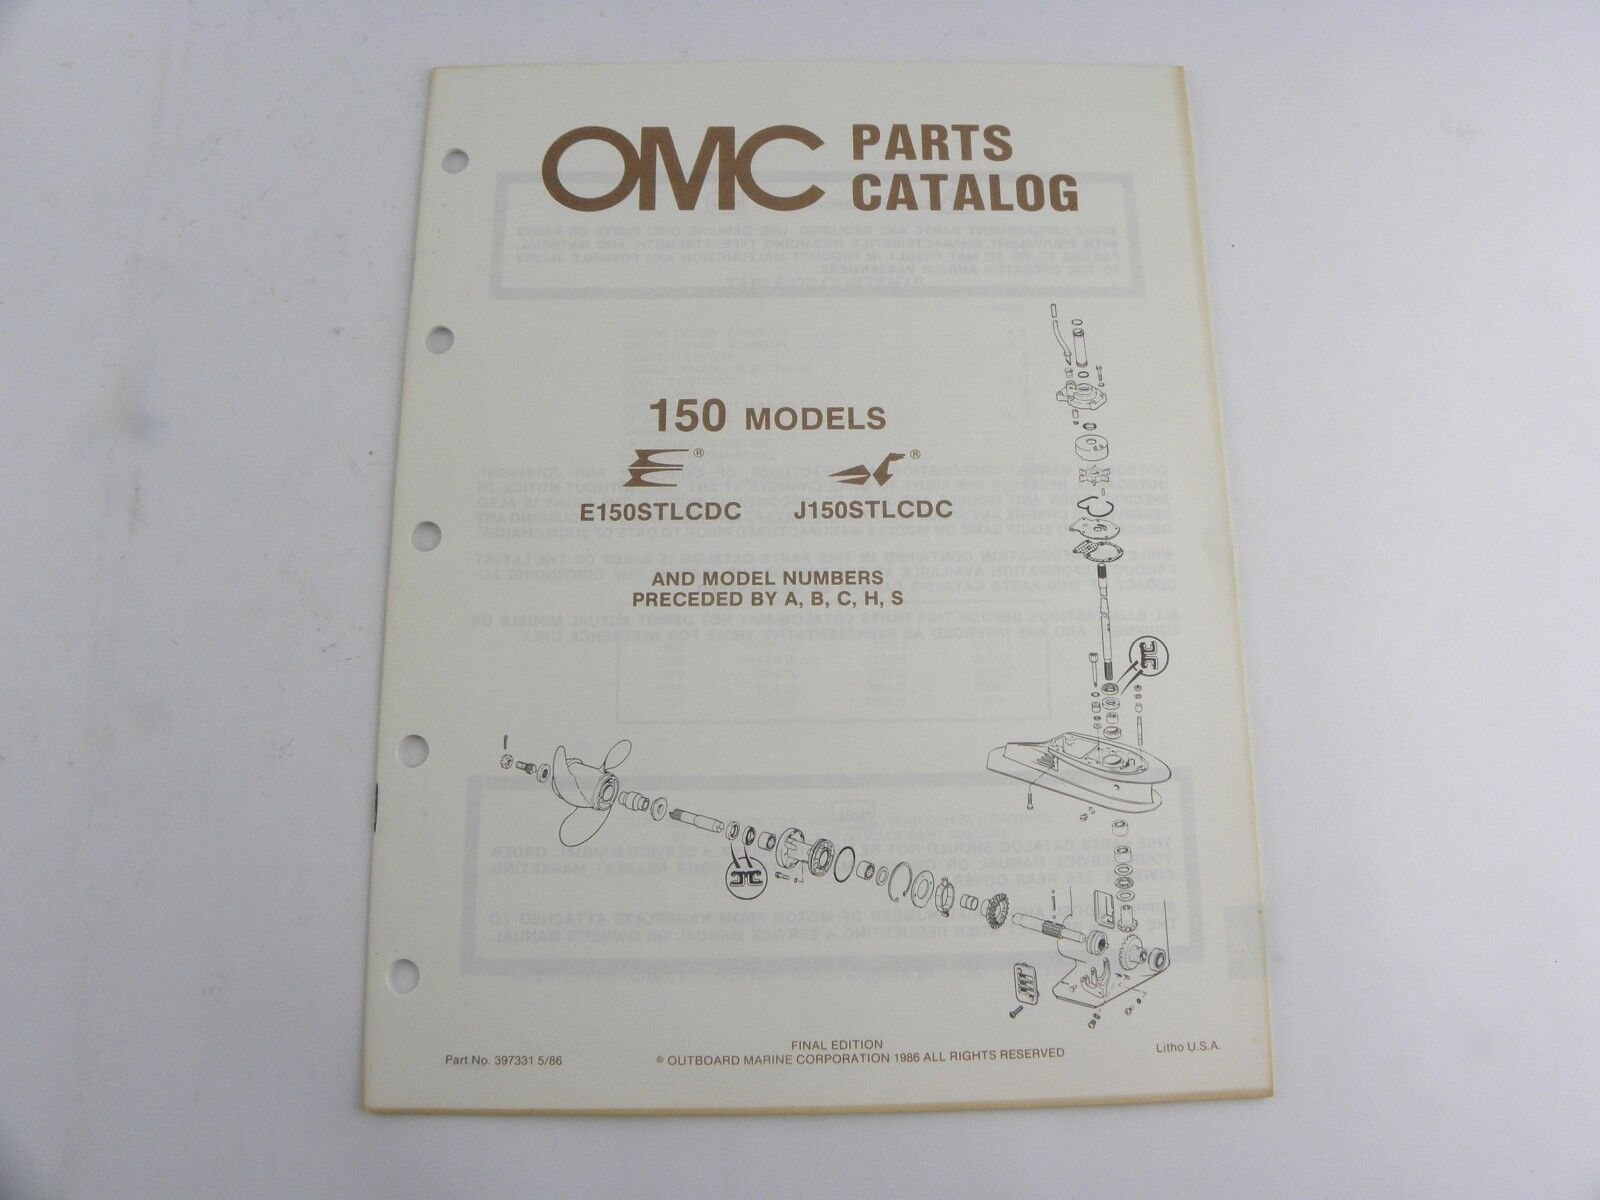 Evinrude Johnson 150 Models Outboard Motor Parts Catalog Manual 1986 OMC